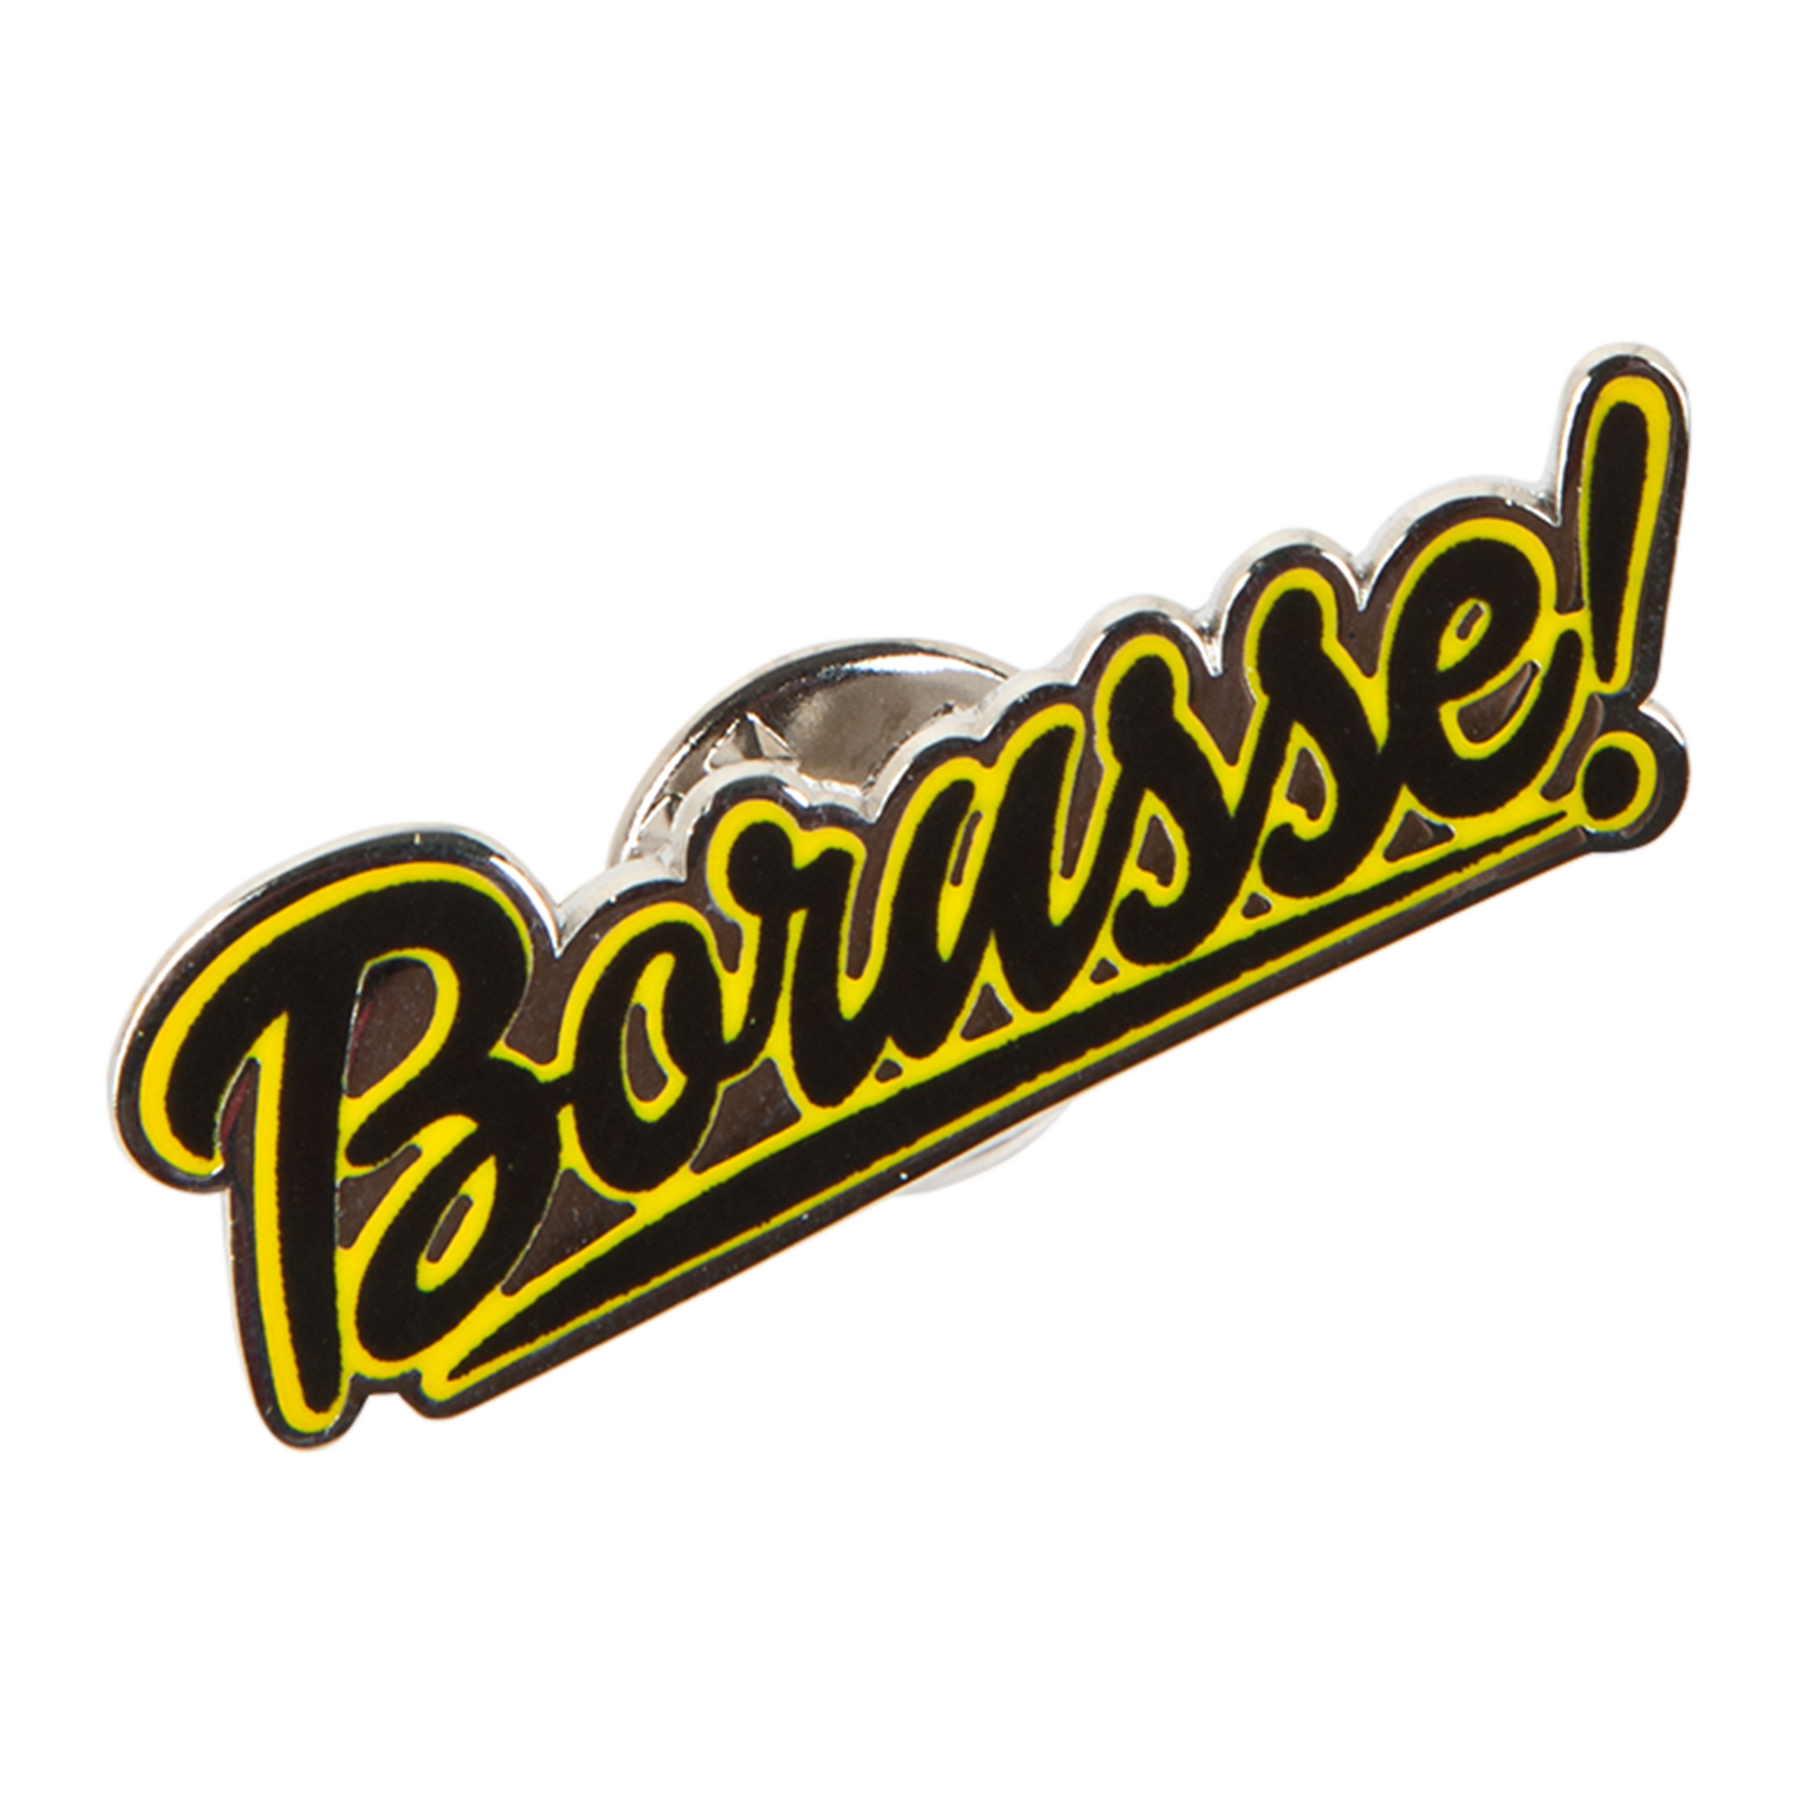 BVB Borusse Pin Badge, N/A